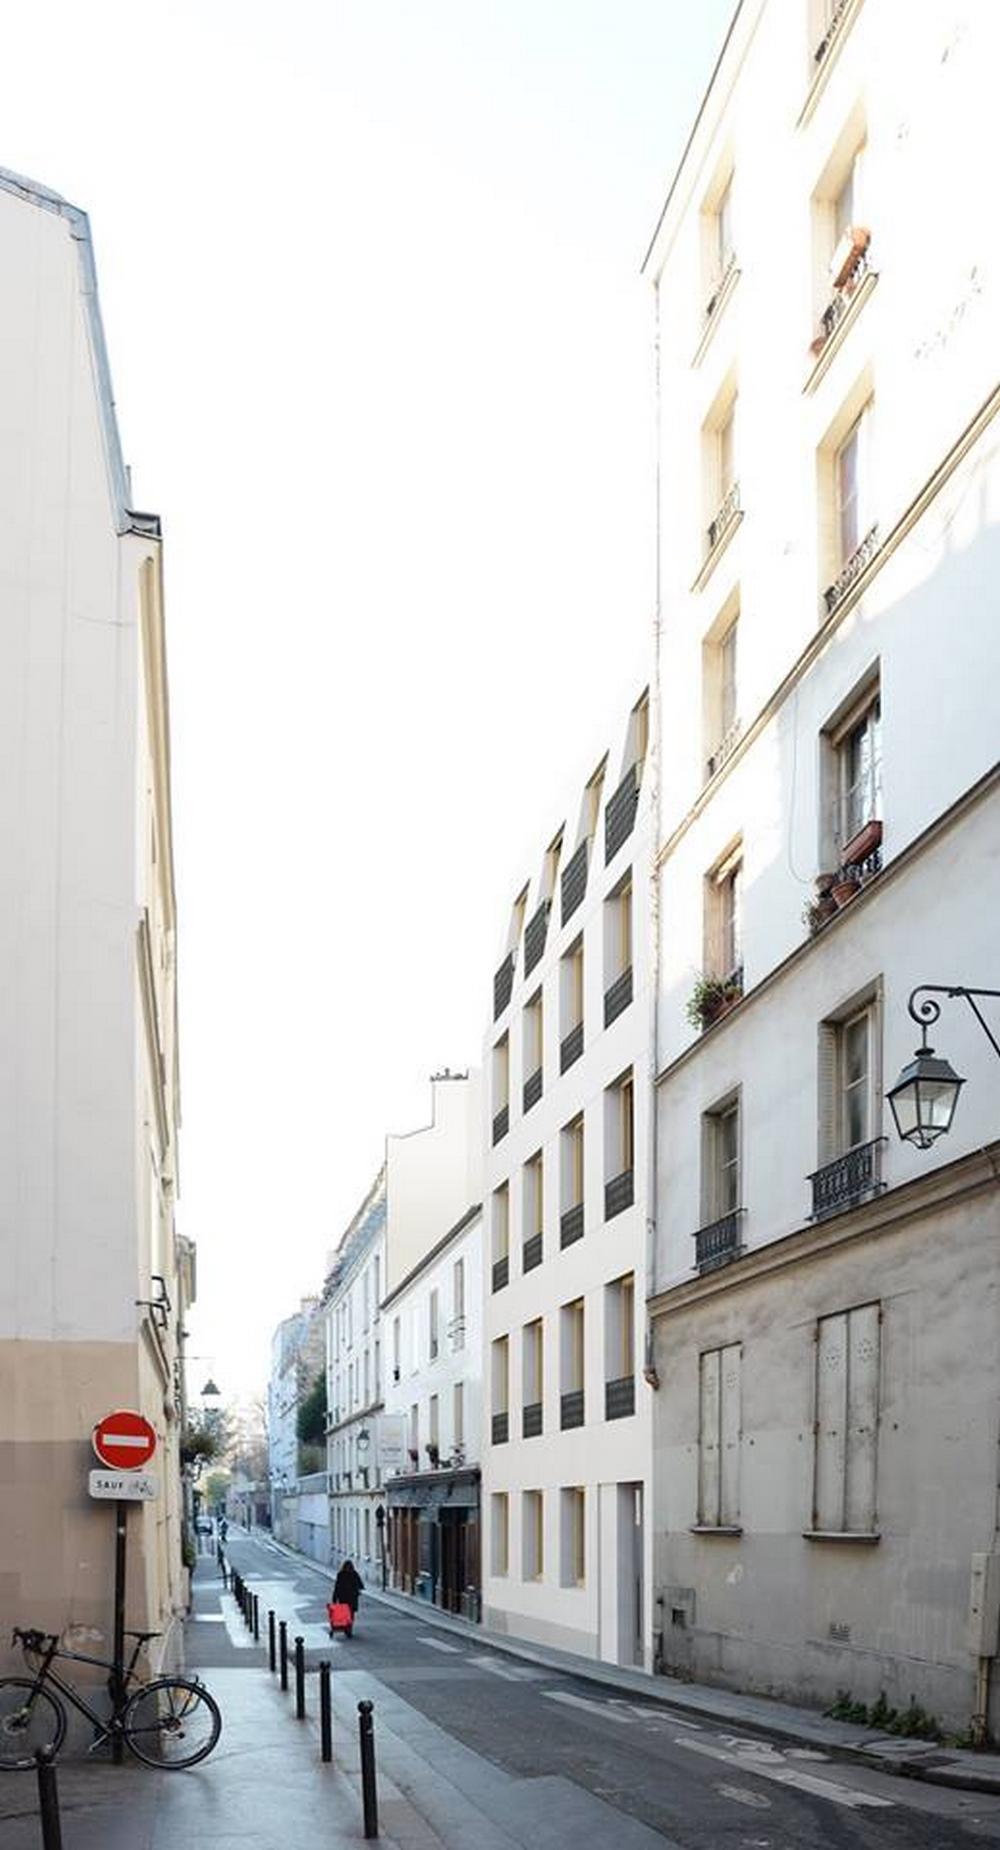 ecallard-Paris-15-lgt-sociaux-1-commerce-02.jpg